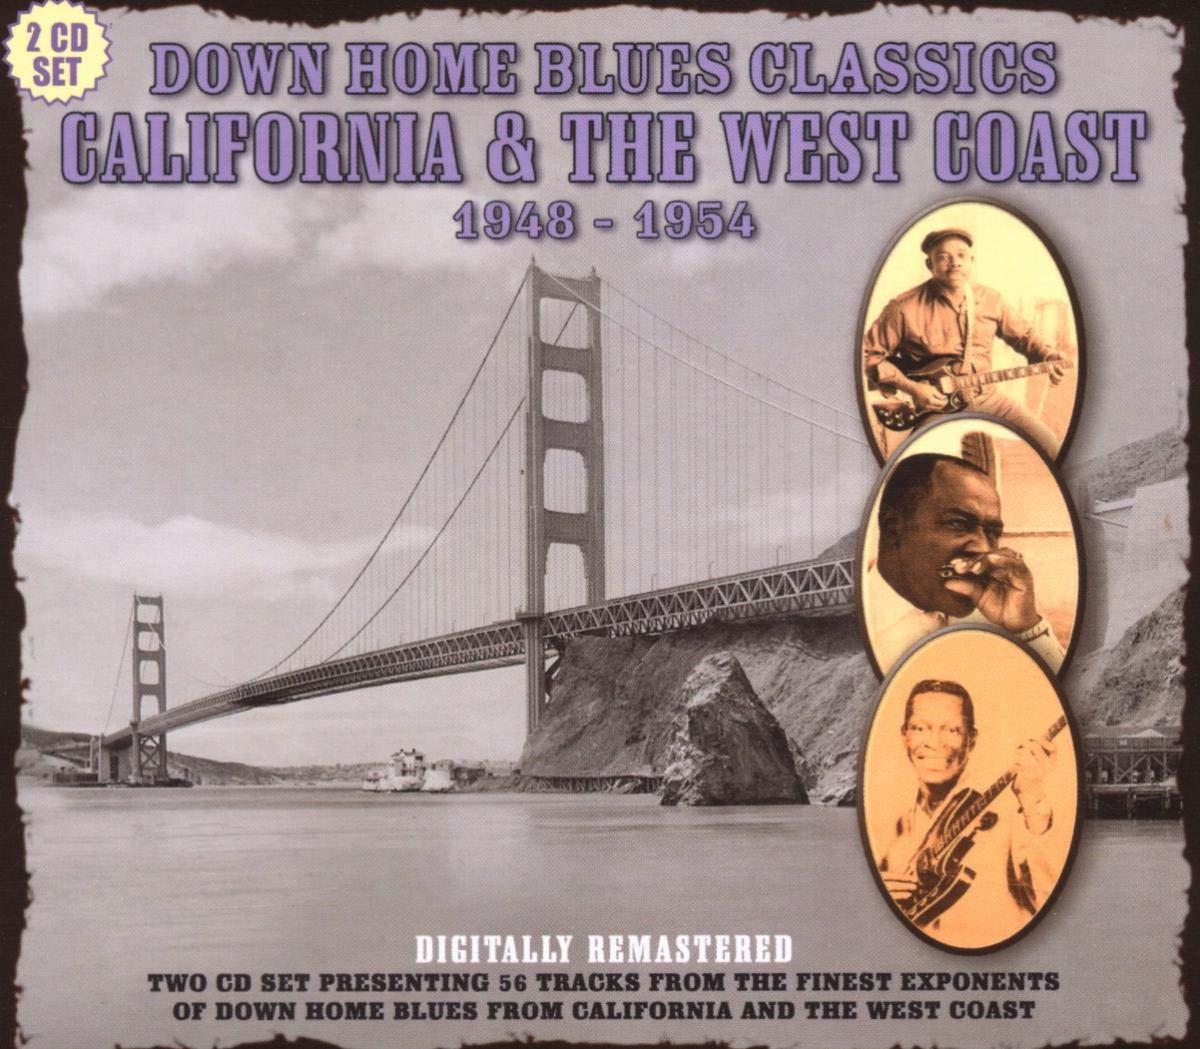 Down Home Blues Classics-West Coast